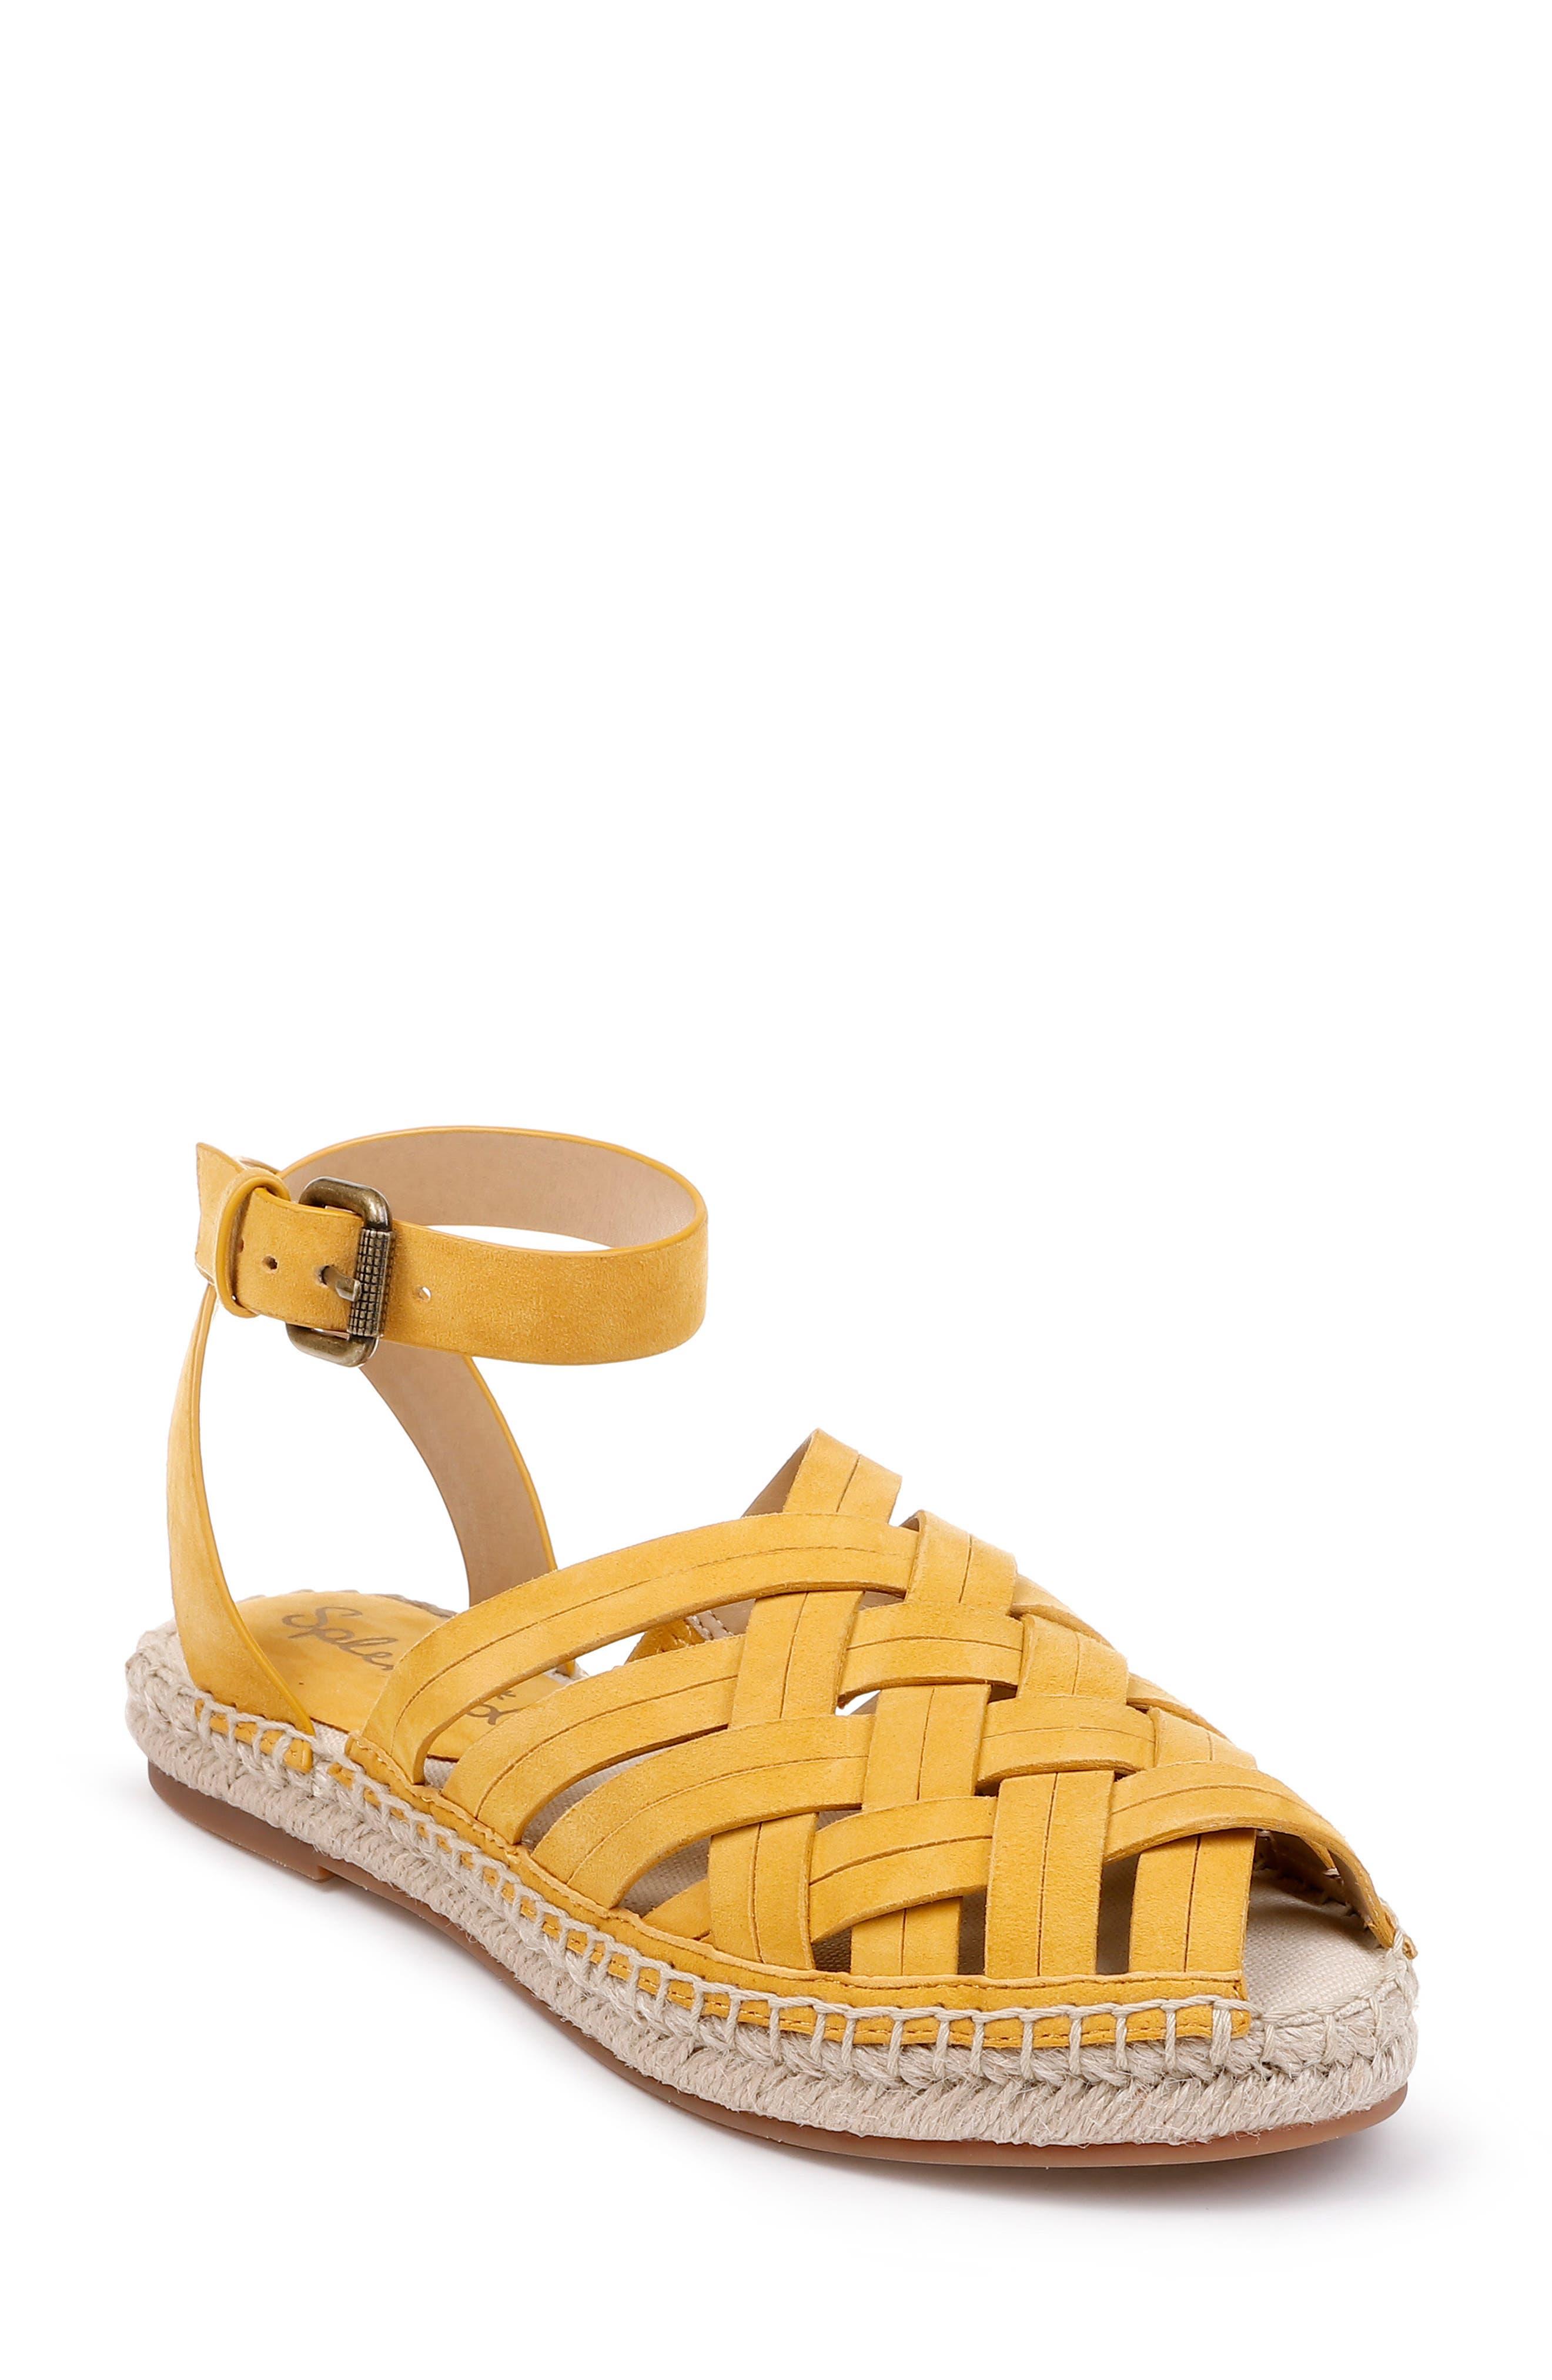 909f7aeb49f9 Shoe Steals  Women s Splendid Sandals